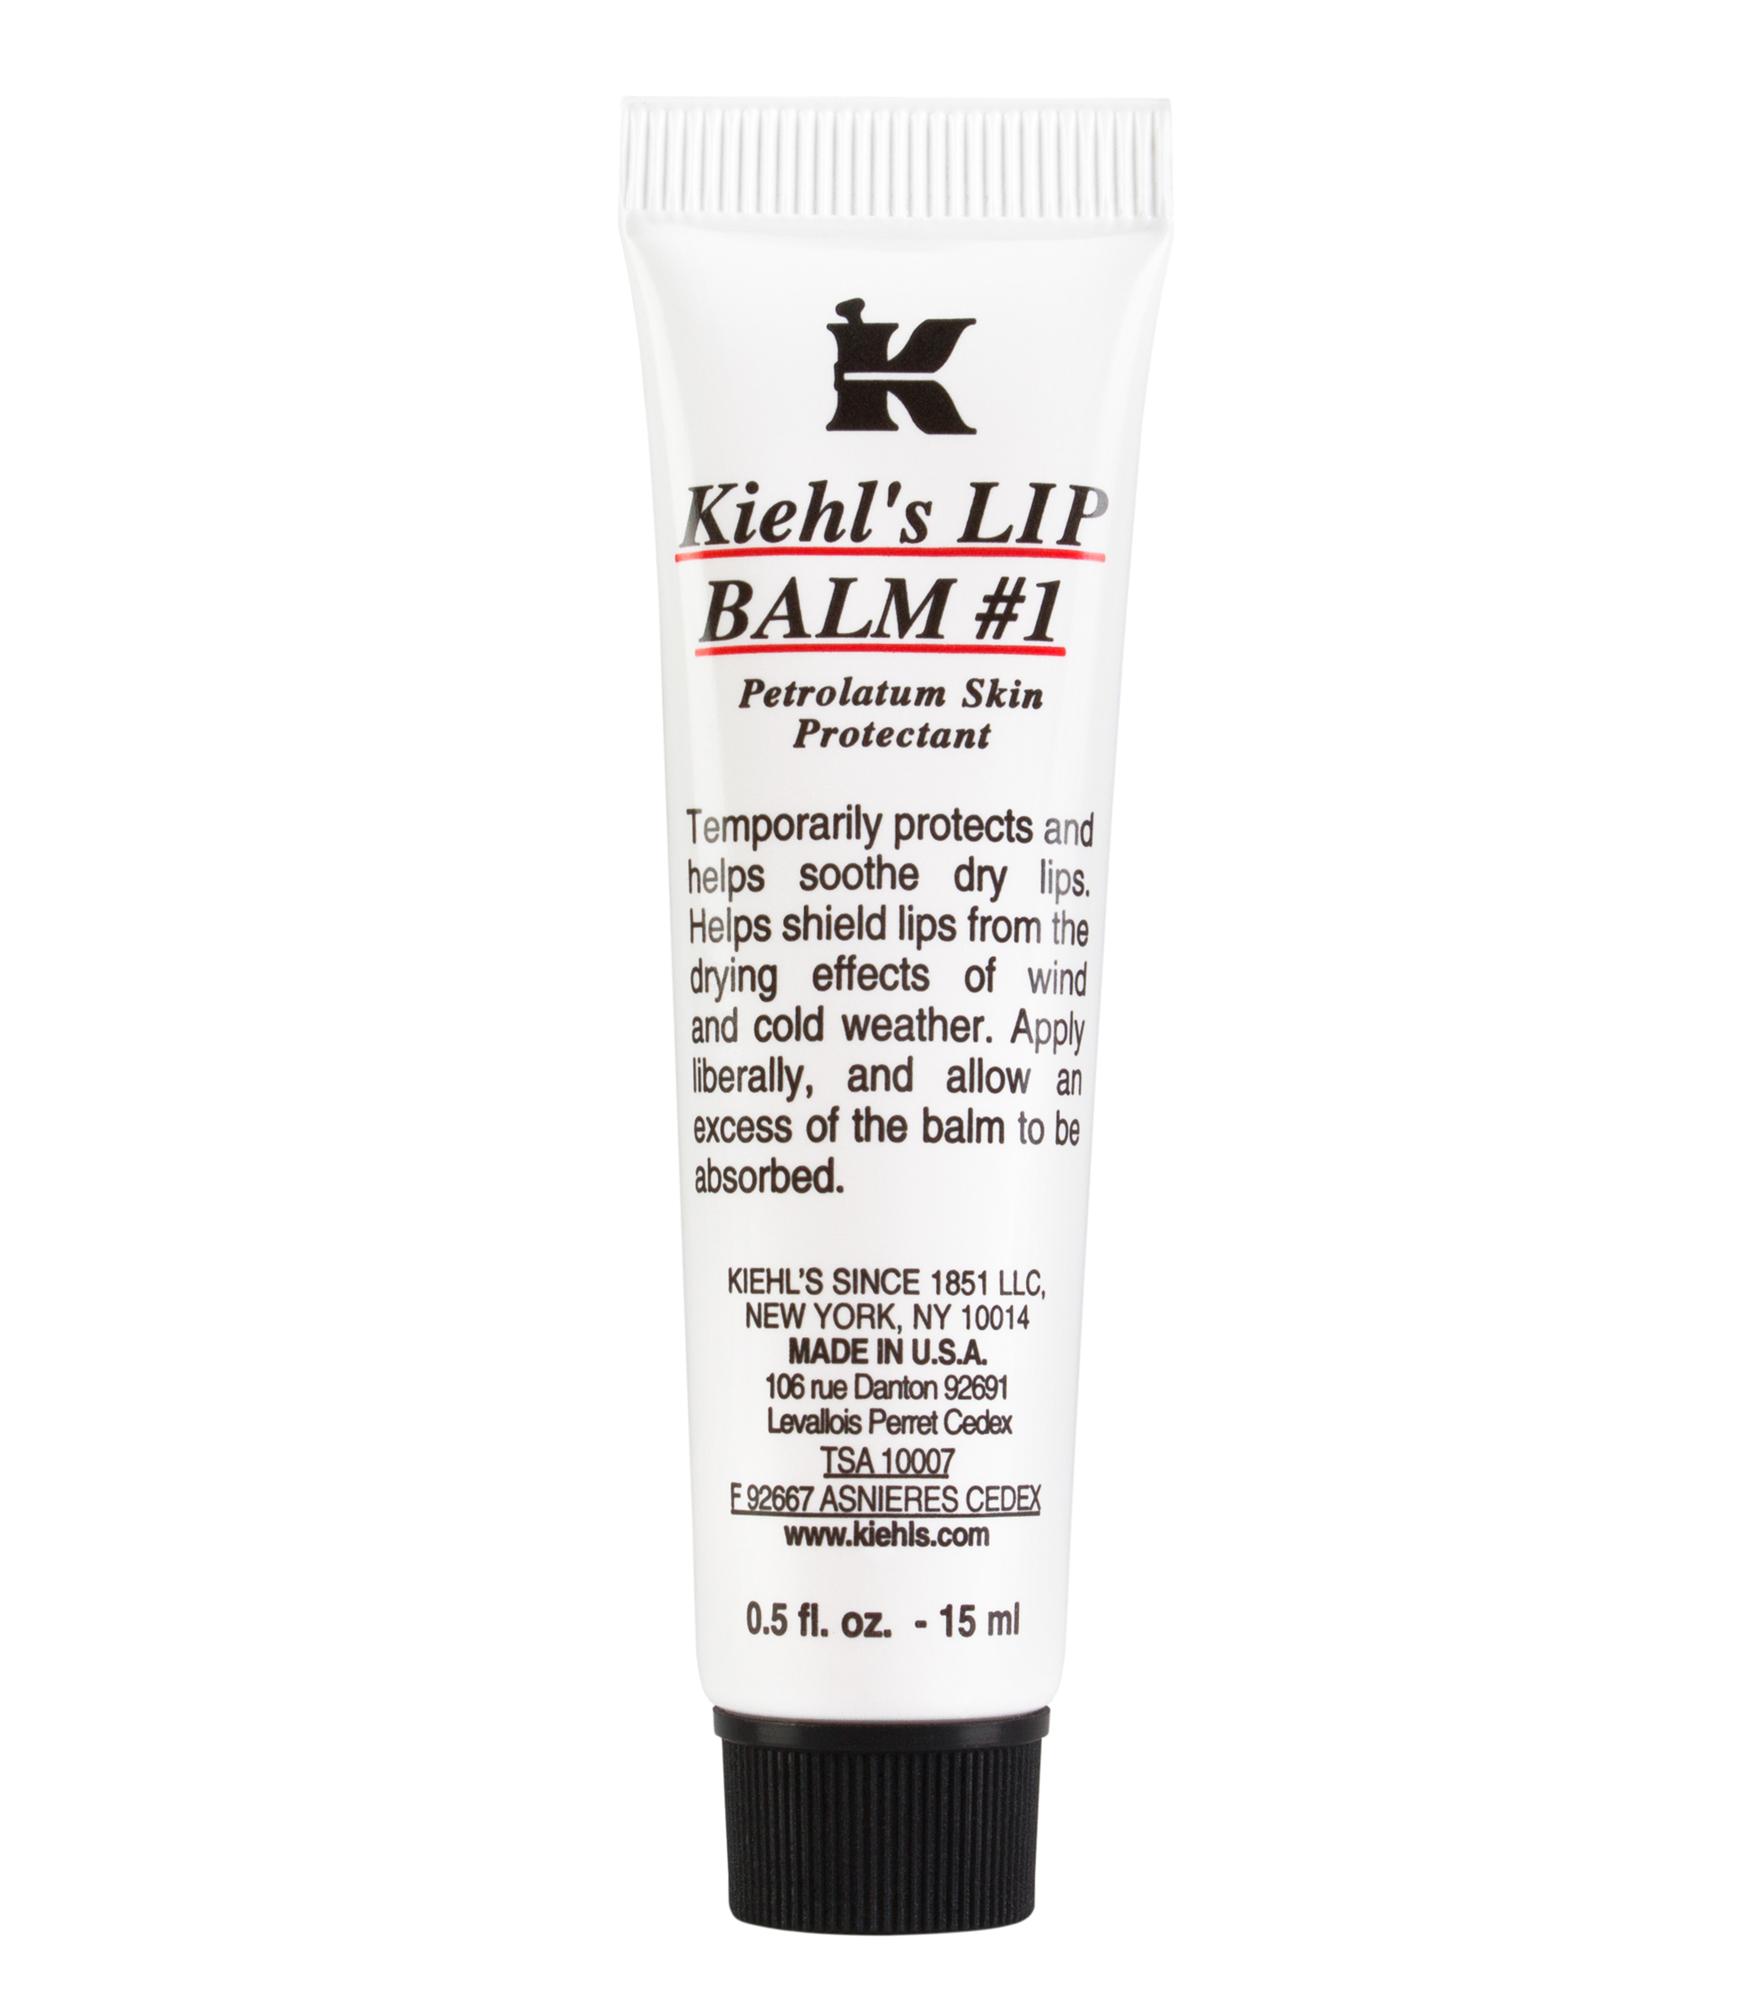 Kiehl's Lip Balm, $9.50